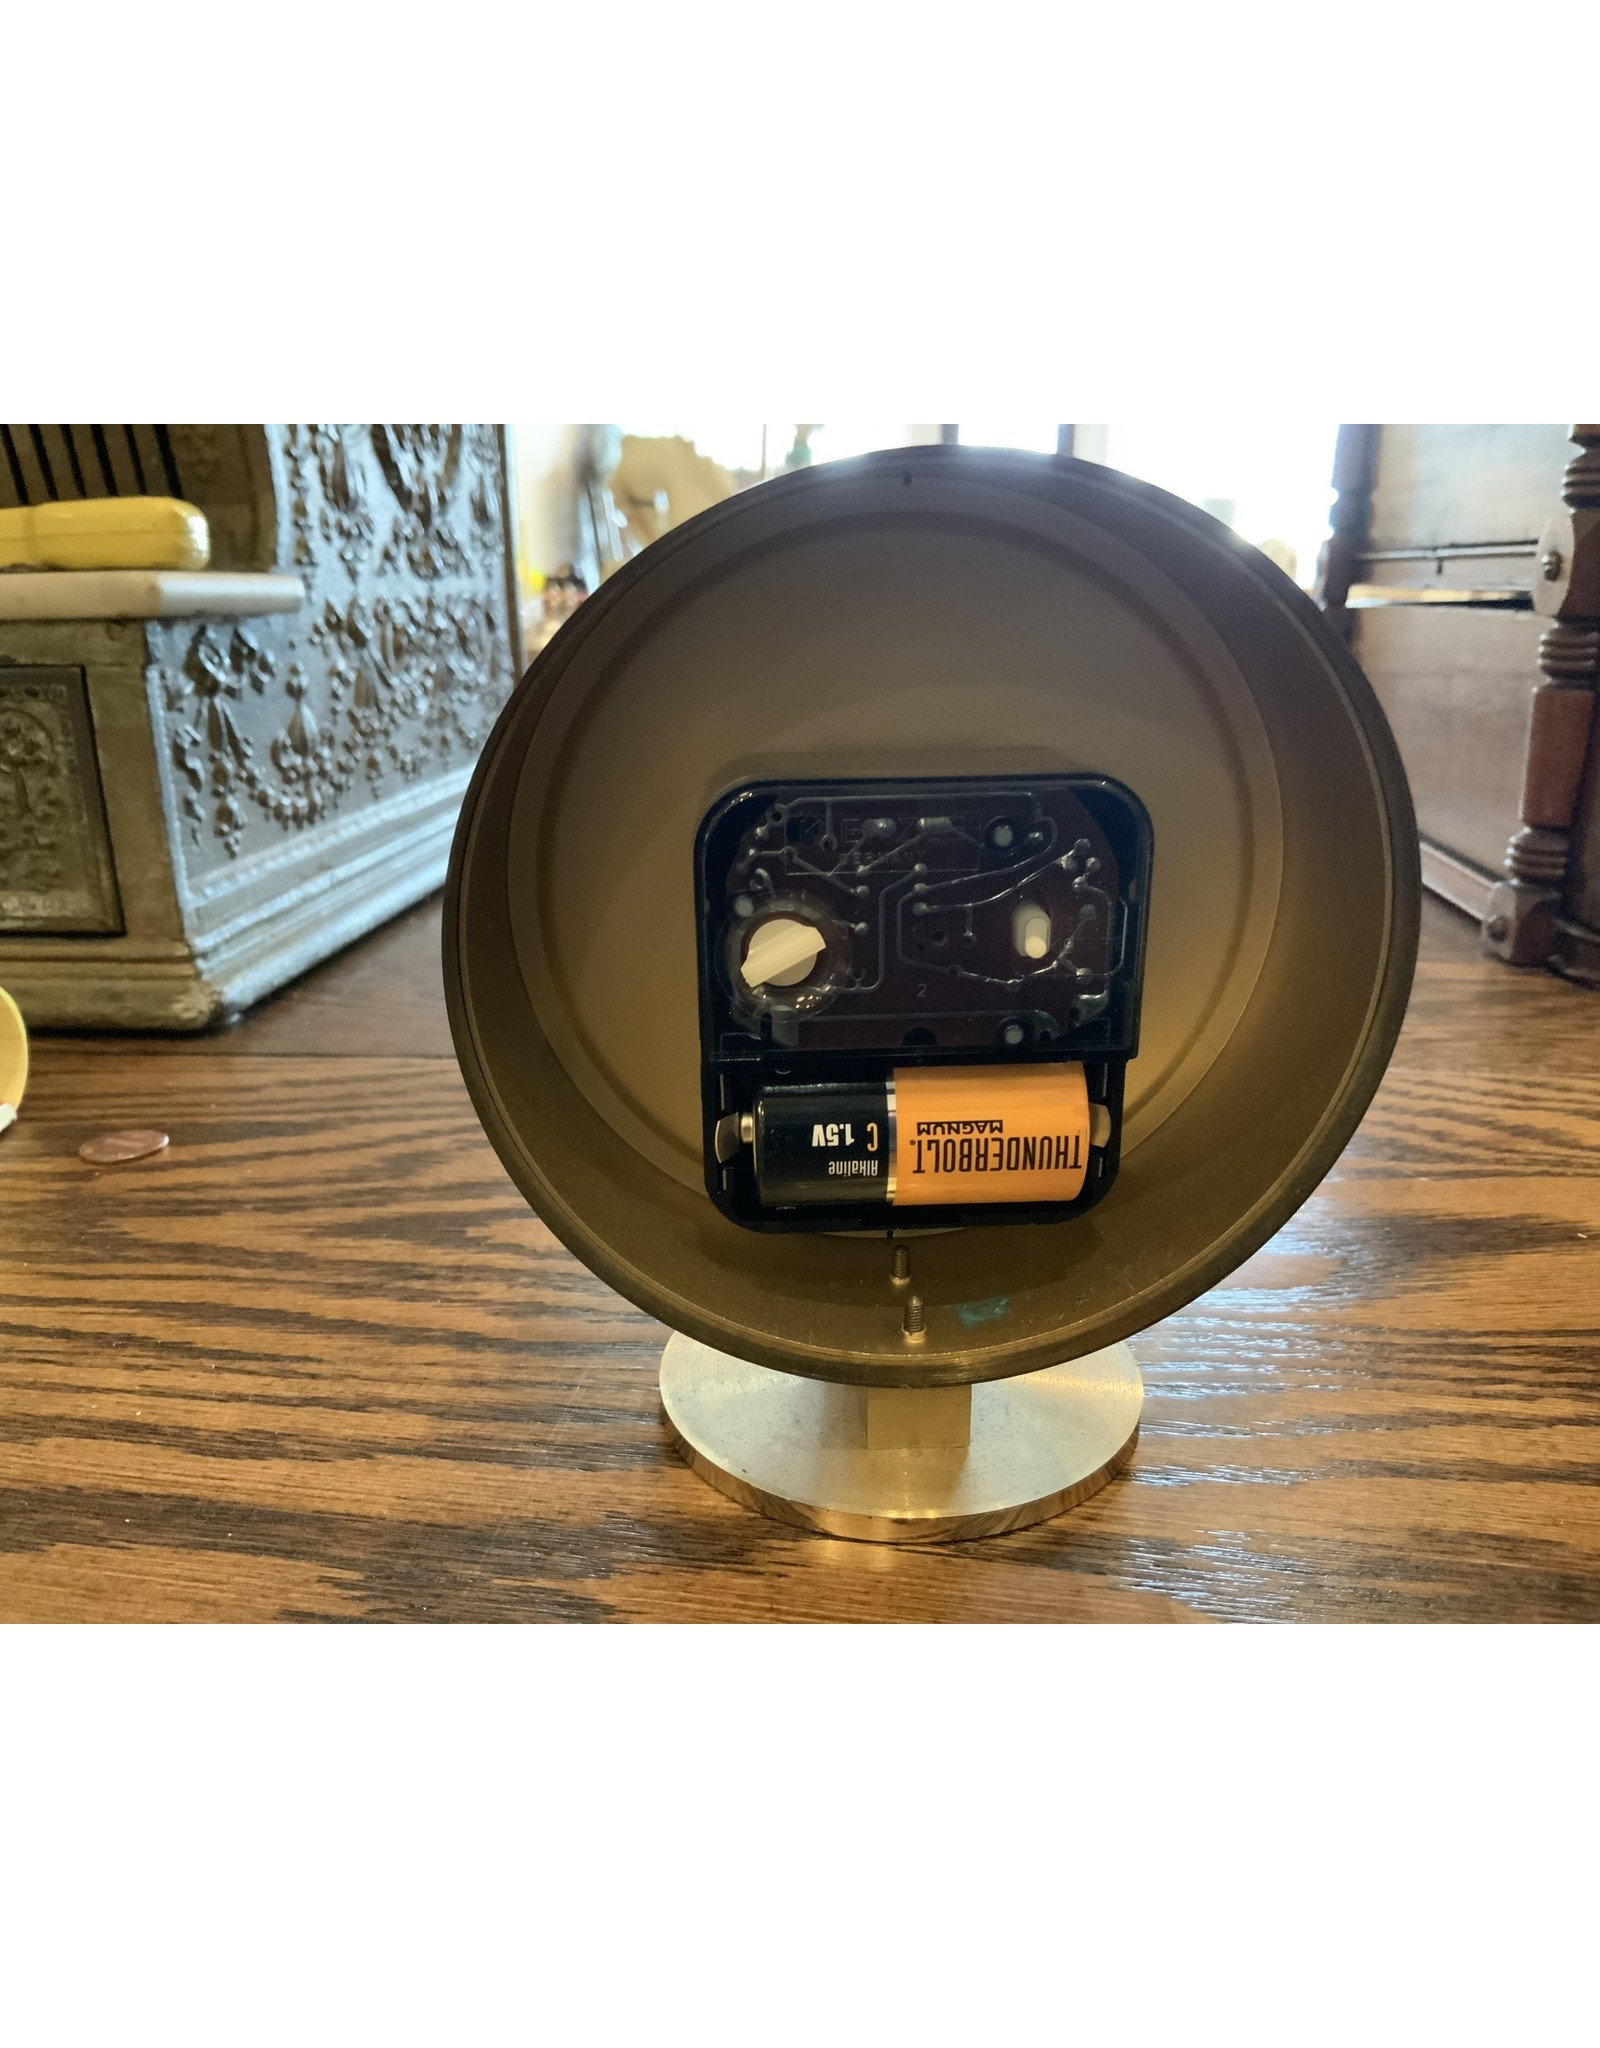 SPV Howard Miller MCM brass desk clock